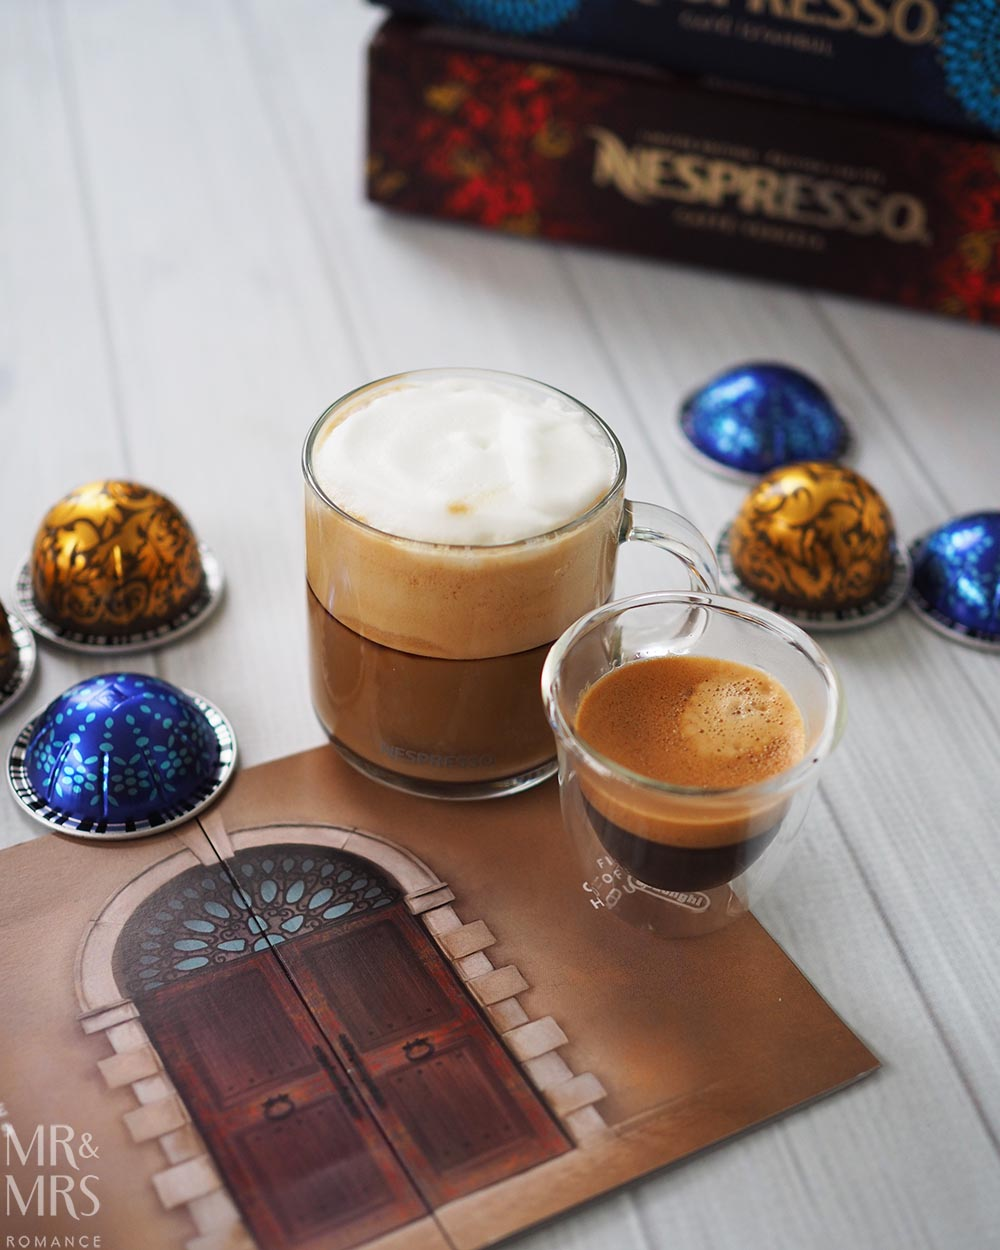 Nespresso new Venezio and Istanbul blends